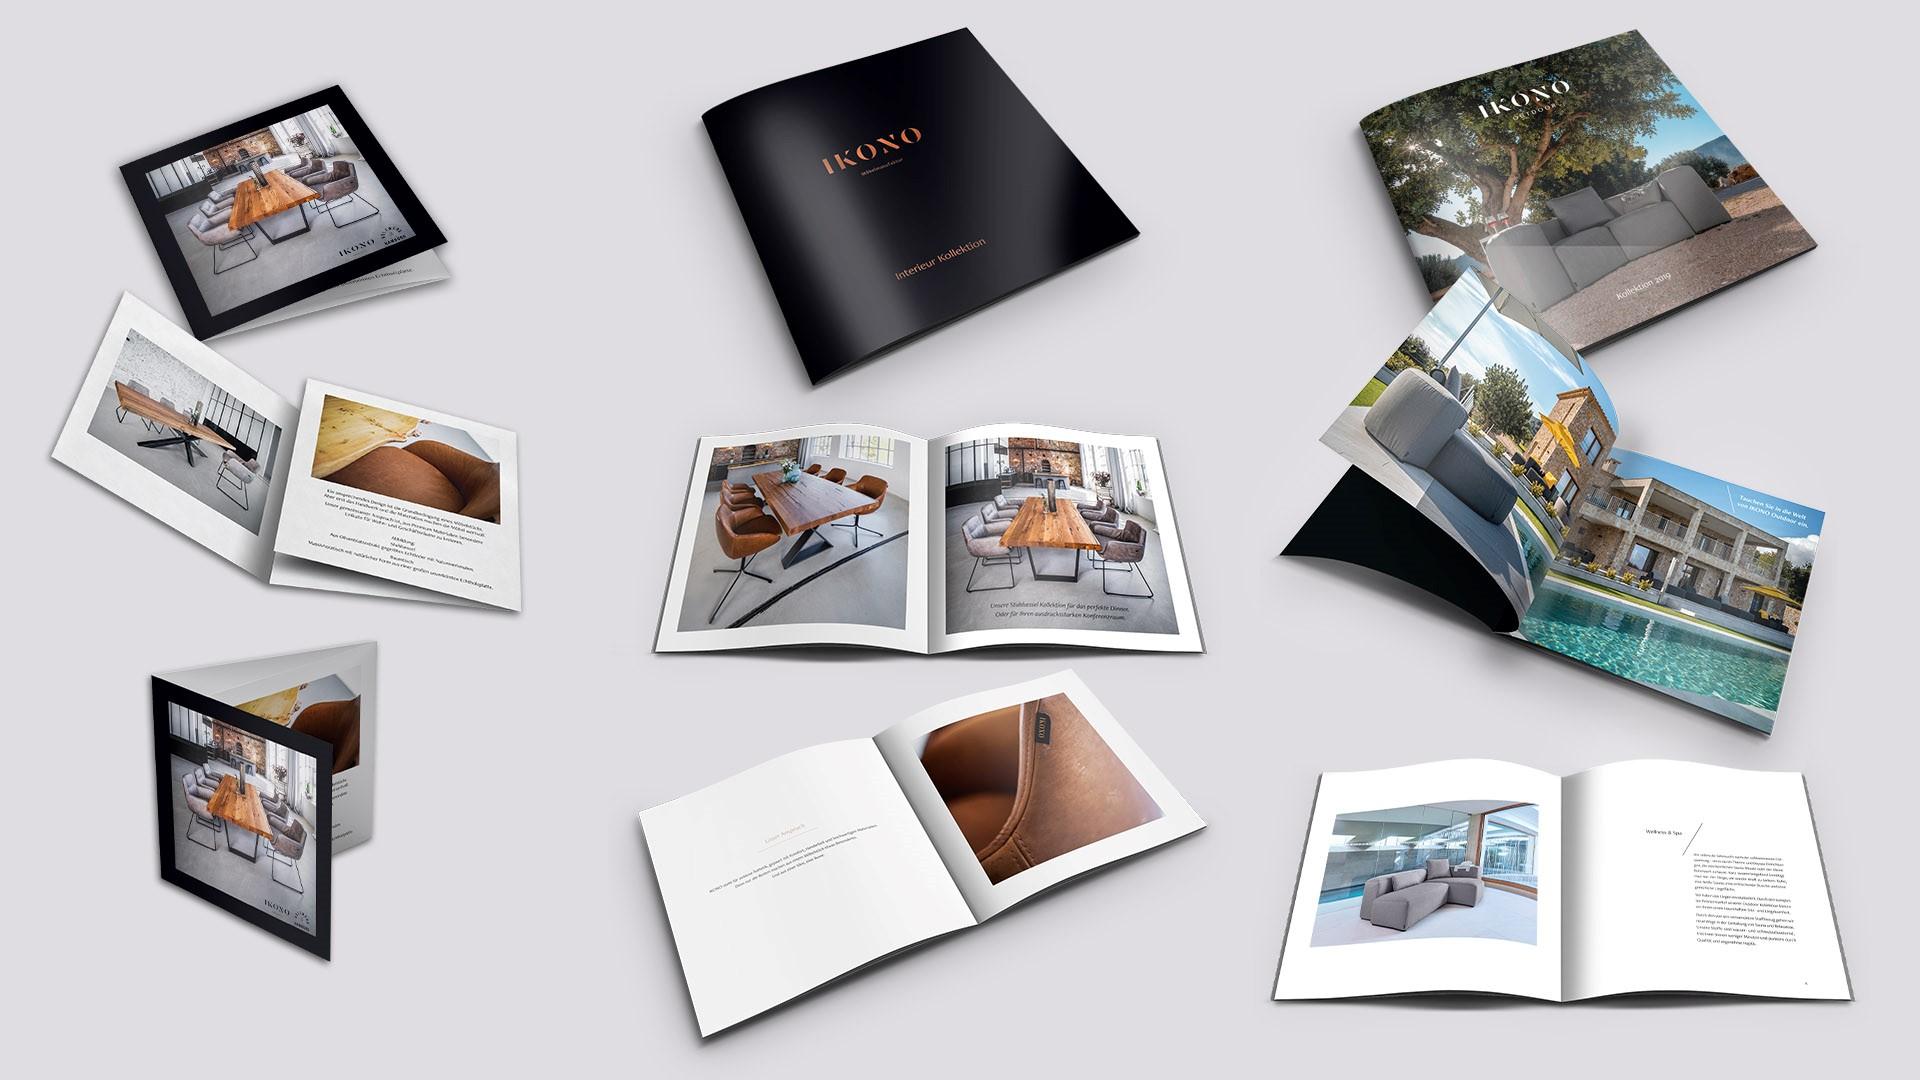 Print-Materialien-Broschüre-Flyer-Produktkatalog-Kundenprojekt-Referenz-HafenRaum.jpg